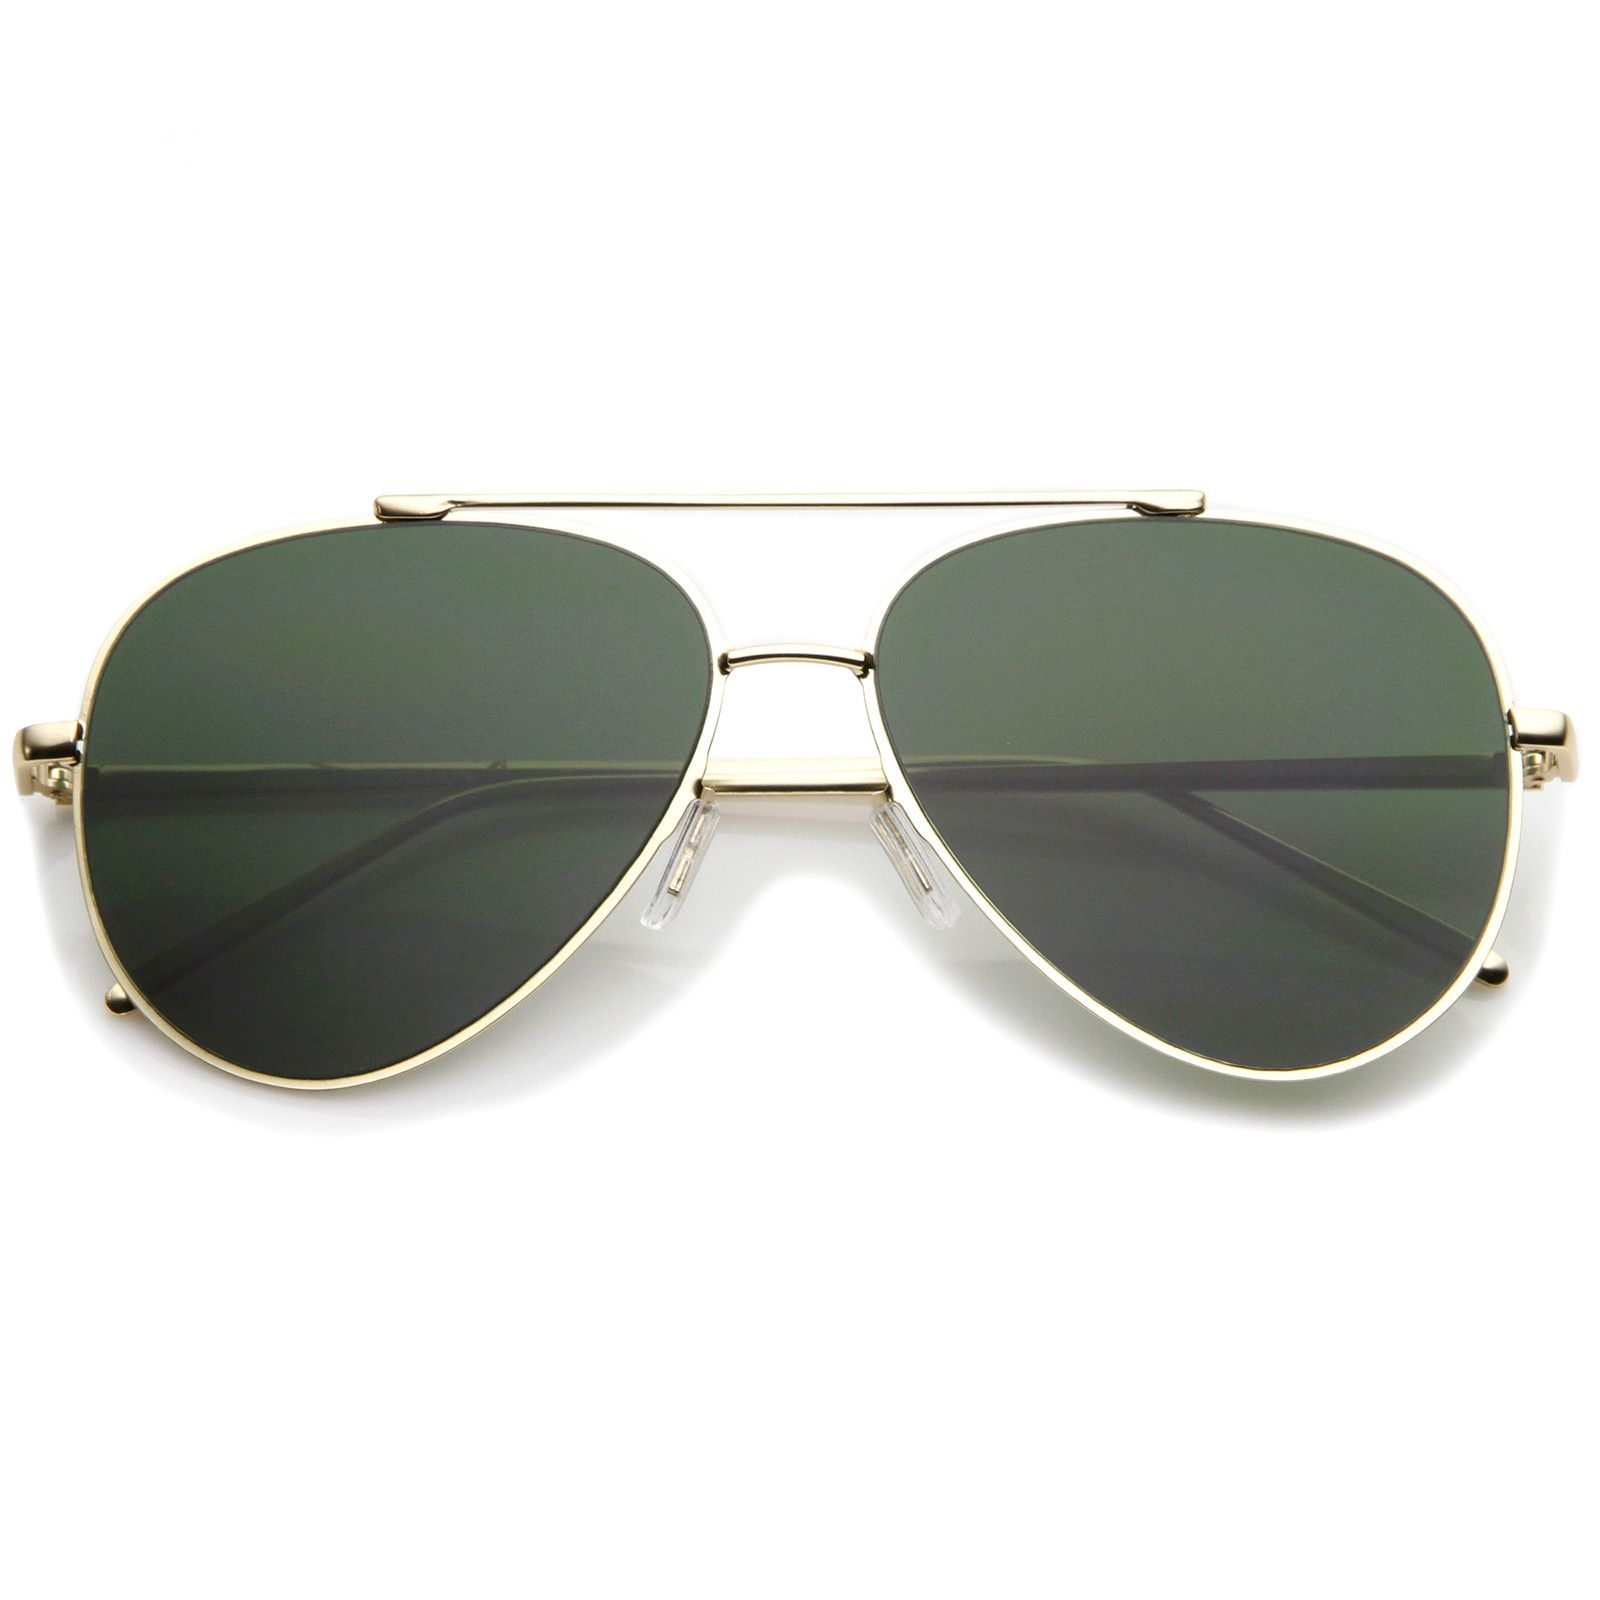 a54177f06 Classic Large Teardrop Crossbar Flat Lens Aviator Sunglasses 60mm # sunglasses #frame #sunglass #mirrored #clear #womens #oversized #sunglassla  #bold #cateye